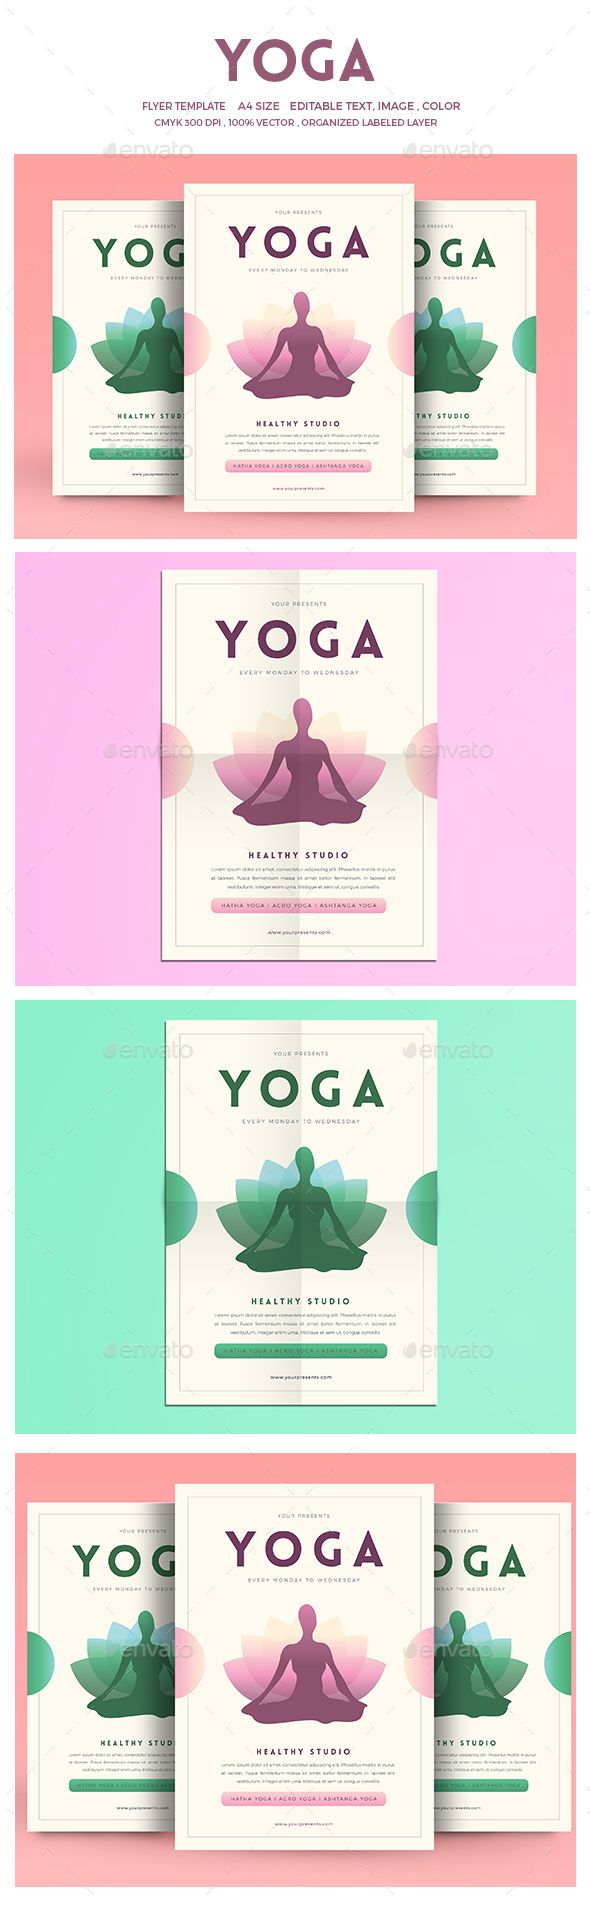 Yoga Flyer Template PSD, AI Illustrator. Download here: http://graphicriver.net/item/yoga-flyer/16920069?ref=ksioks